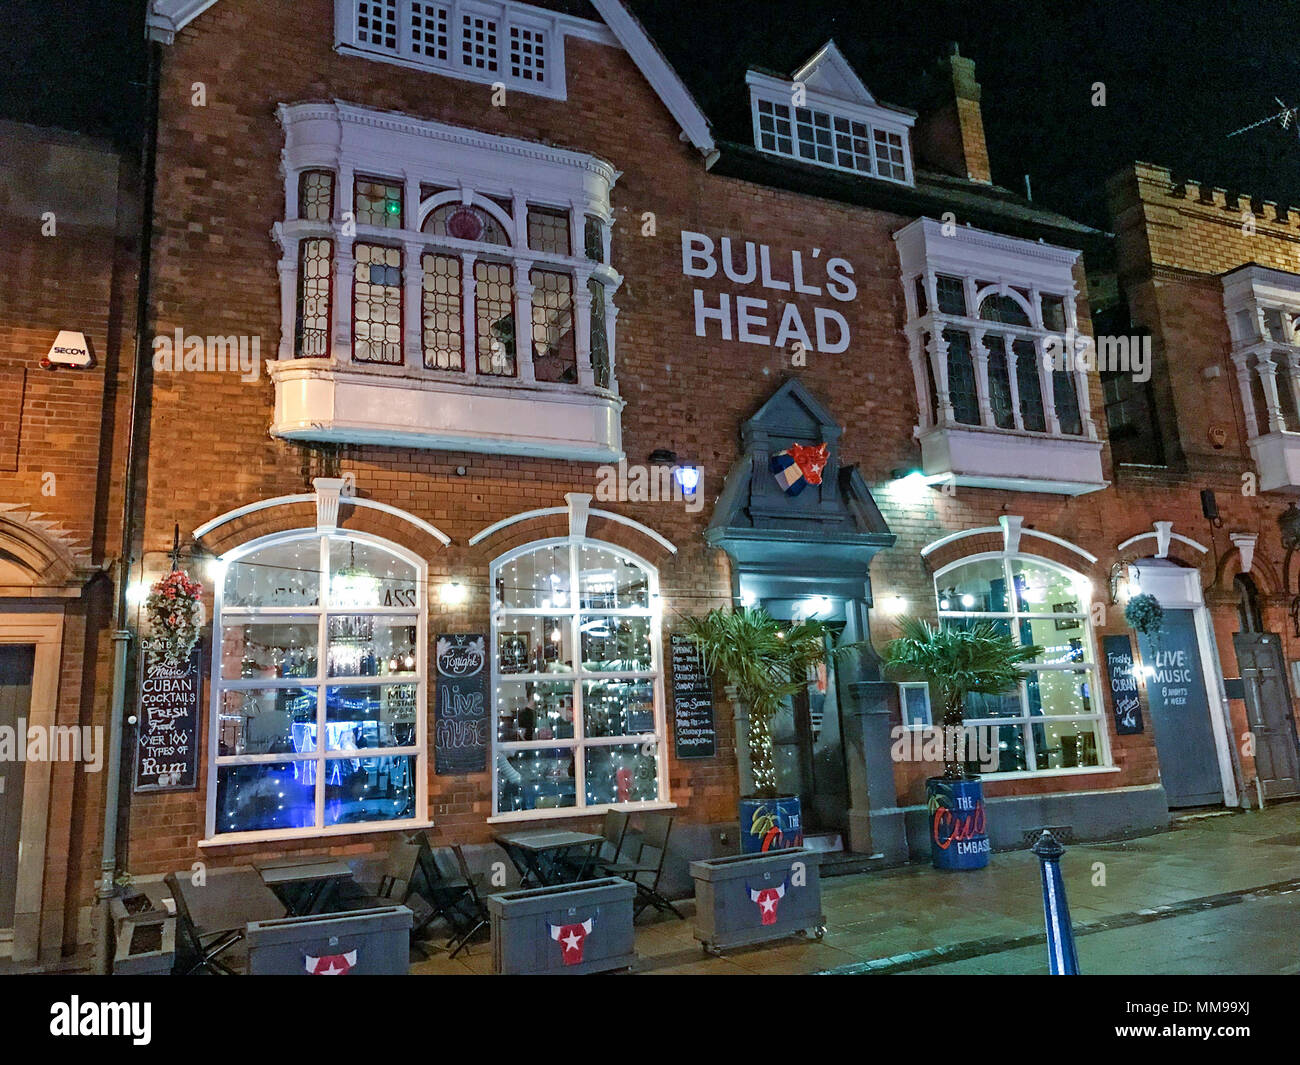 GoTonysmith,@HotpixUK,pub,bar,at,dusk,nighttime,evening,night,B13,village,Moseley